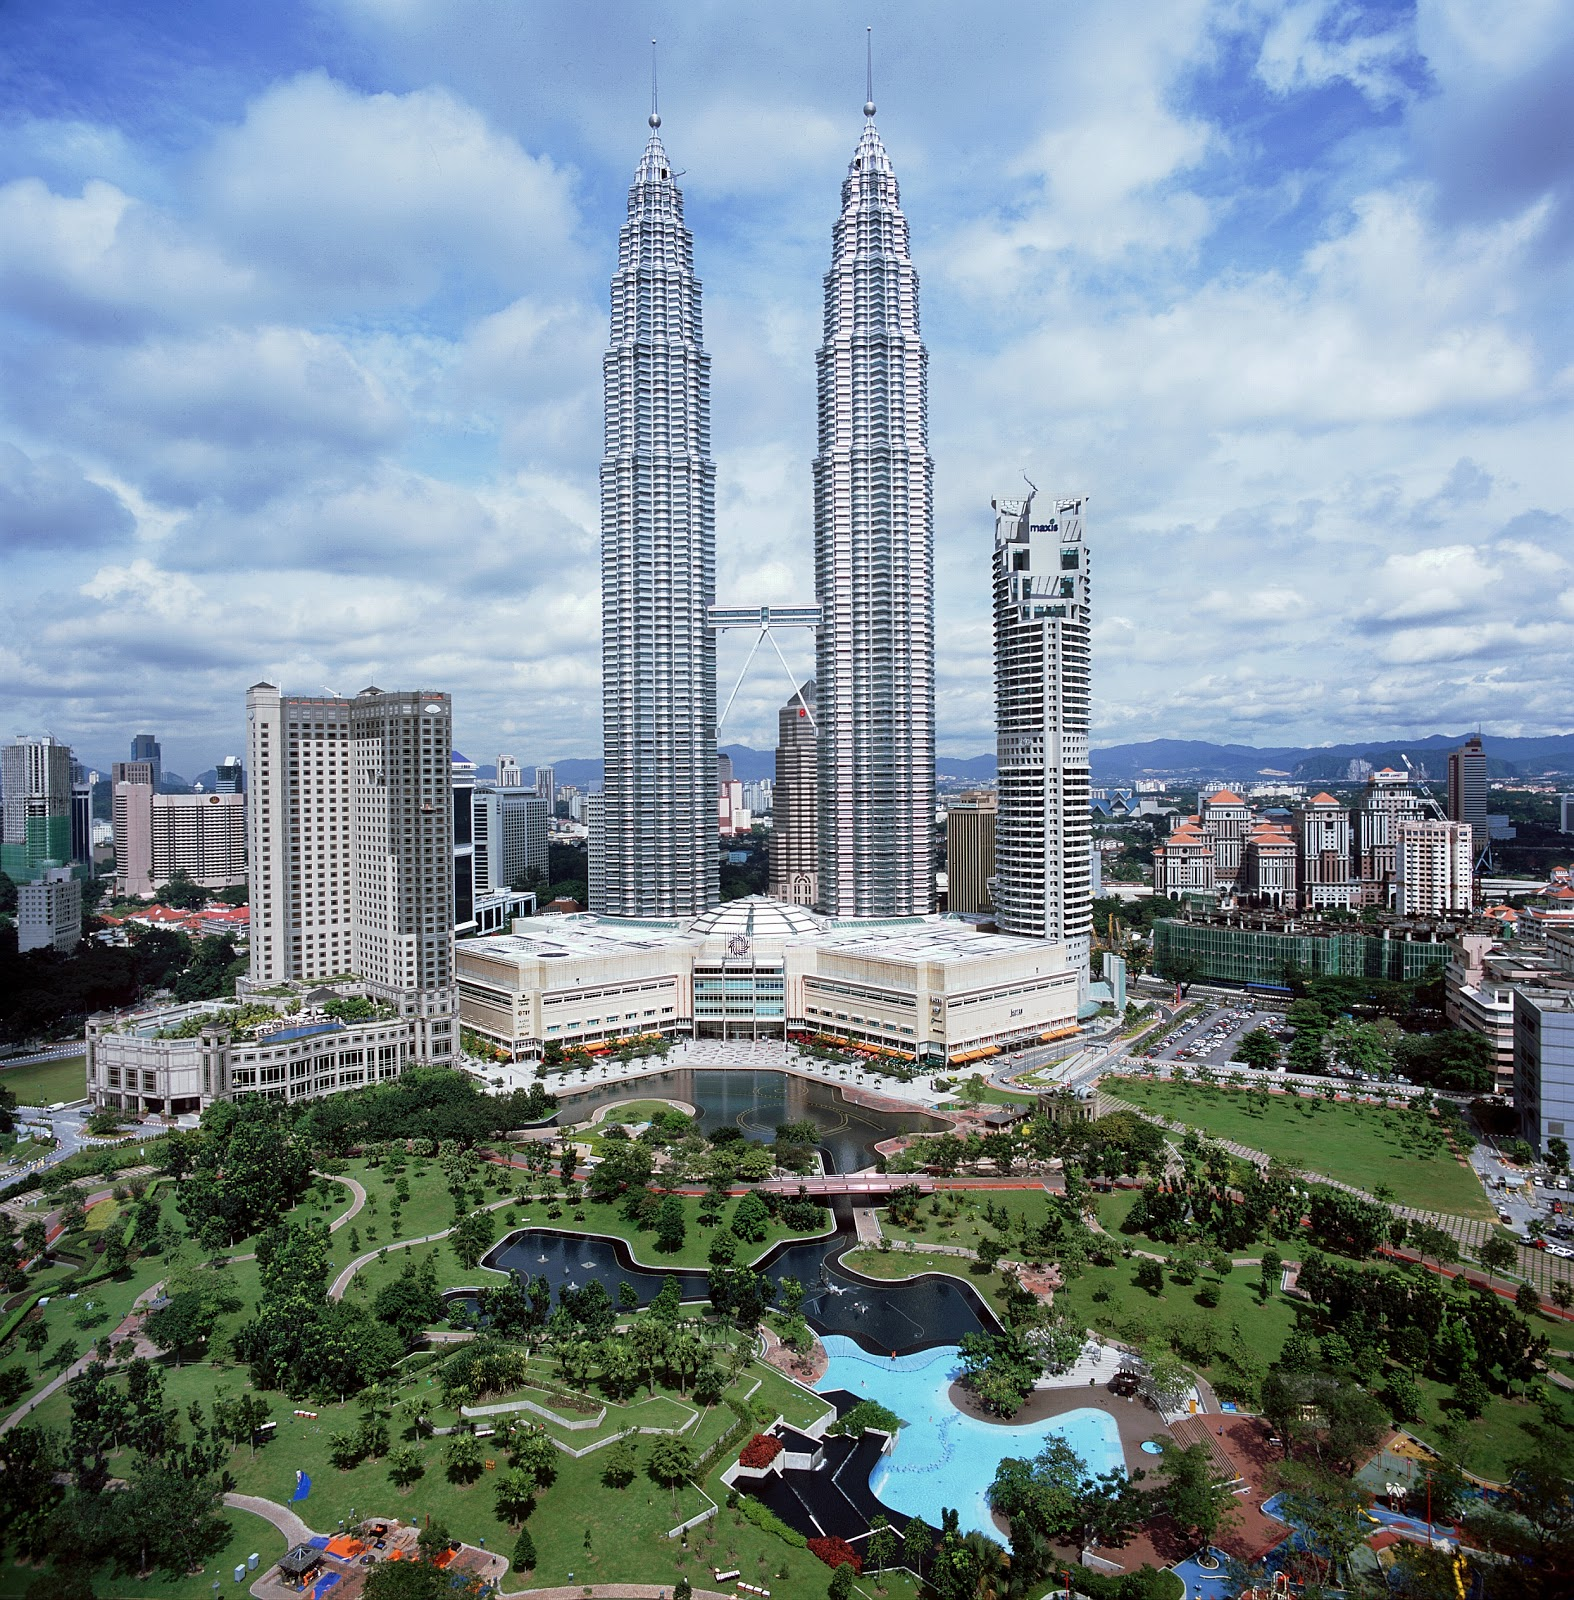 petronas twin towers - photo #25